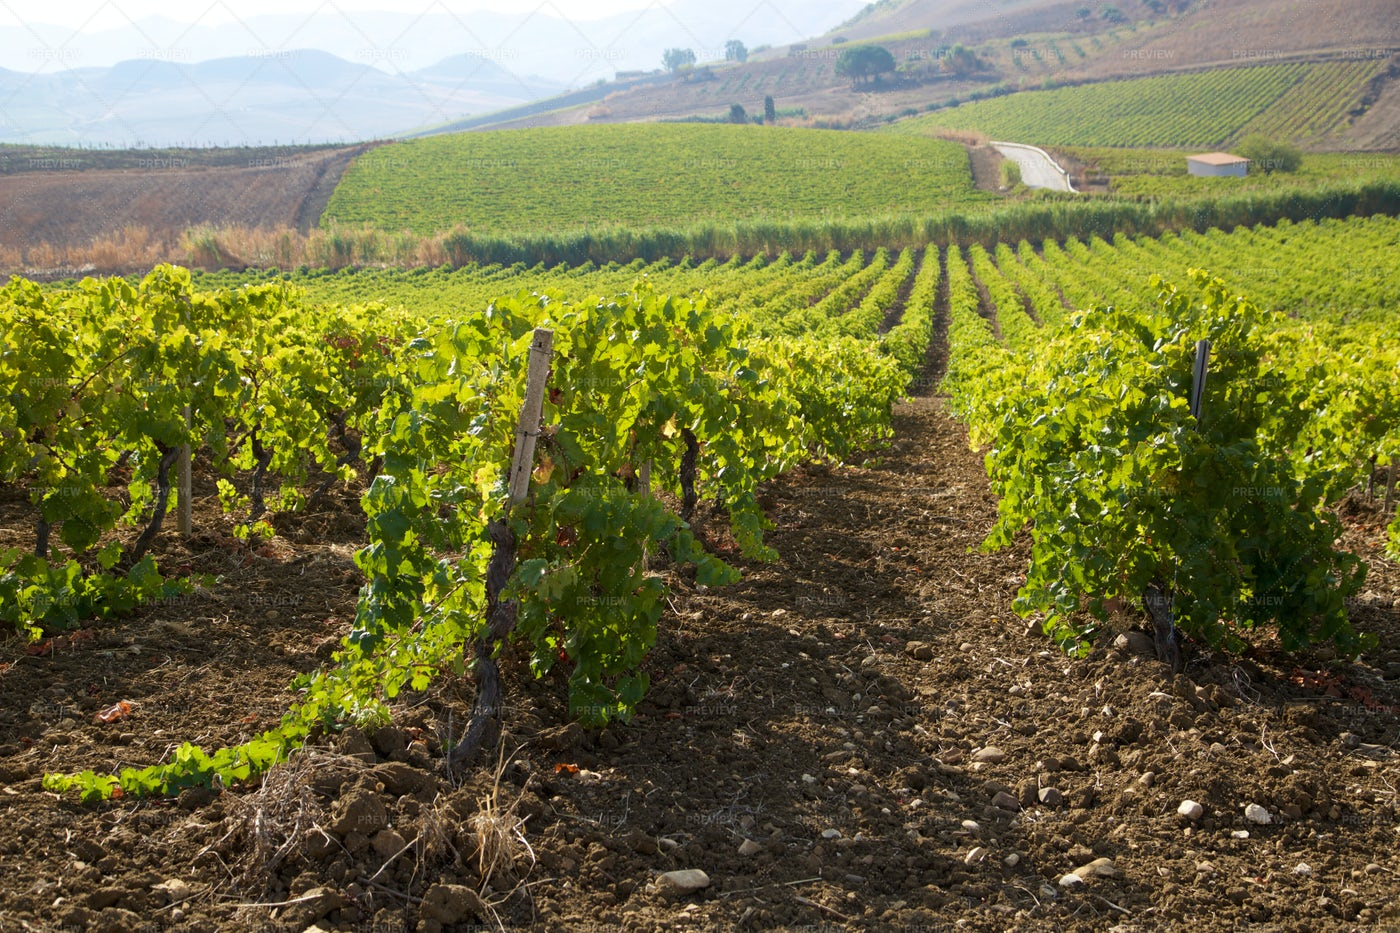 Vineyards In Sicily: Stock Photos